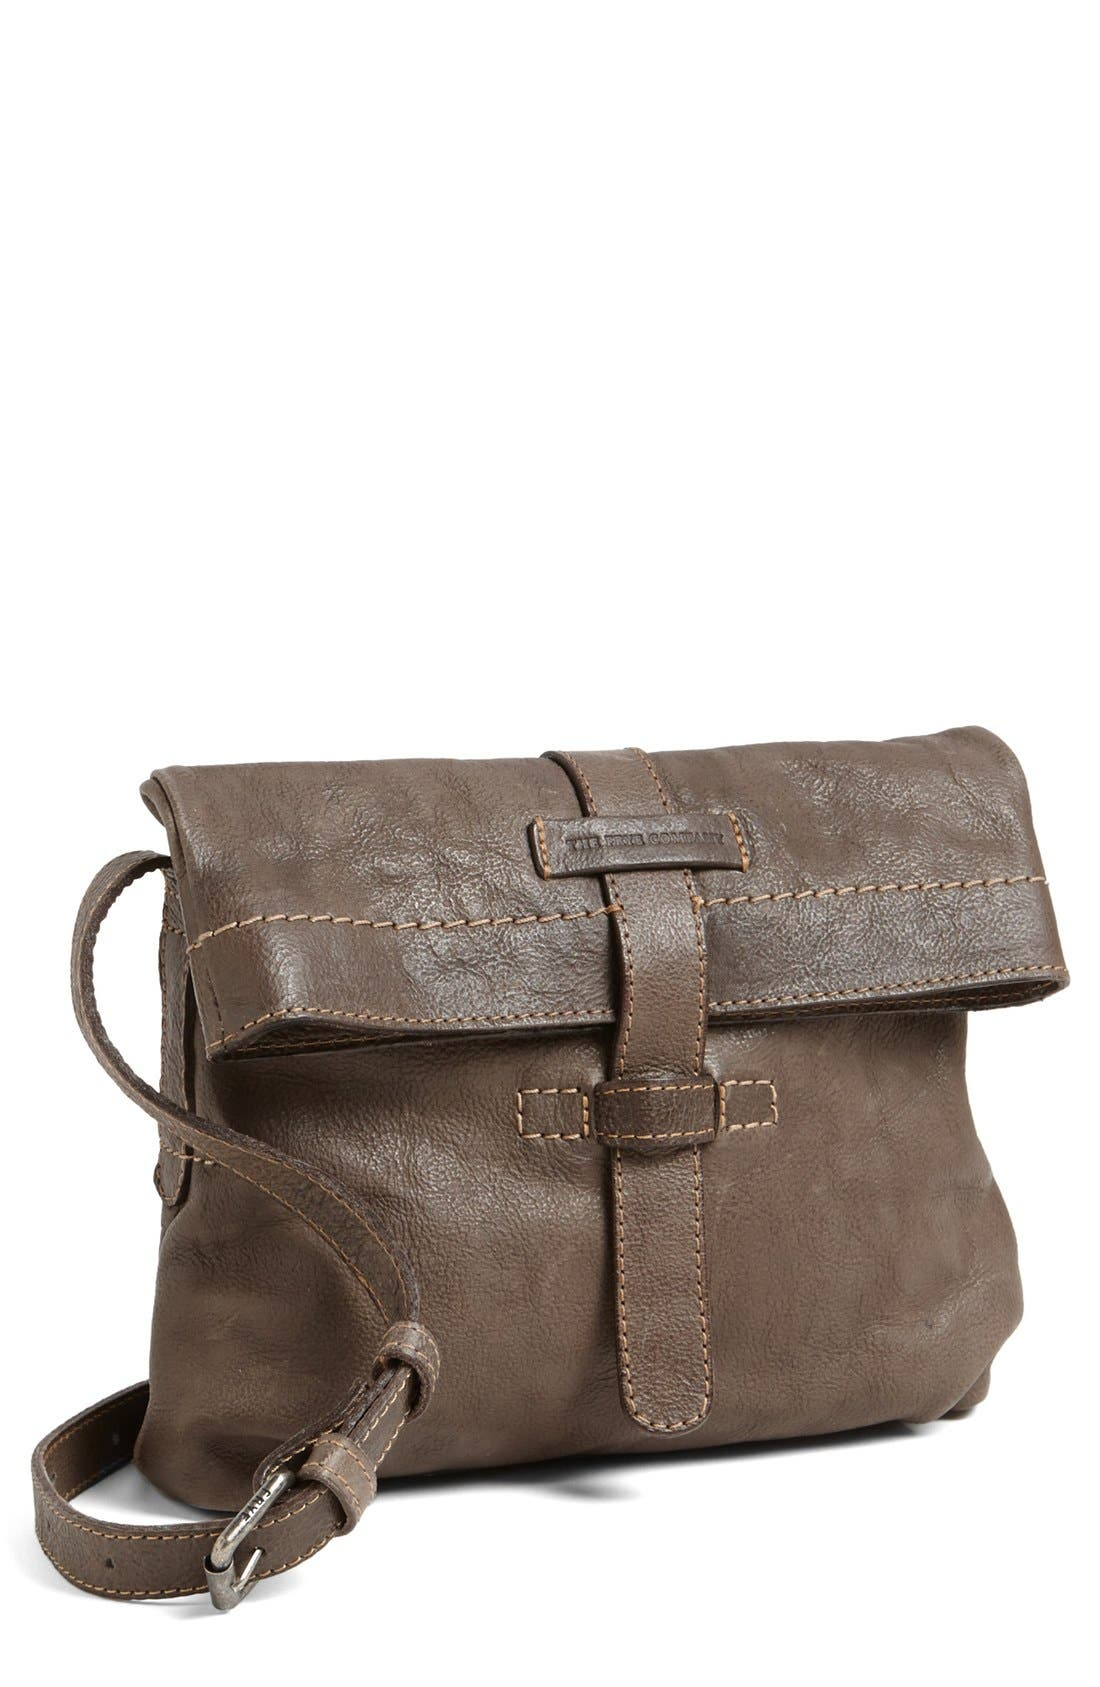 Alternate Image 1 Selected - Frye 'Artisan Foldover' Leather Crossbody Bag